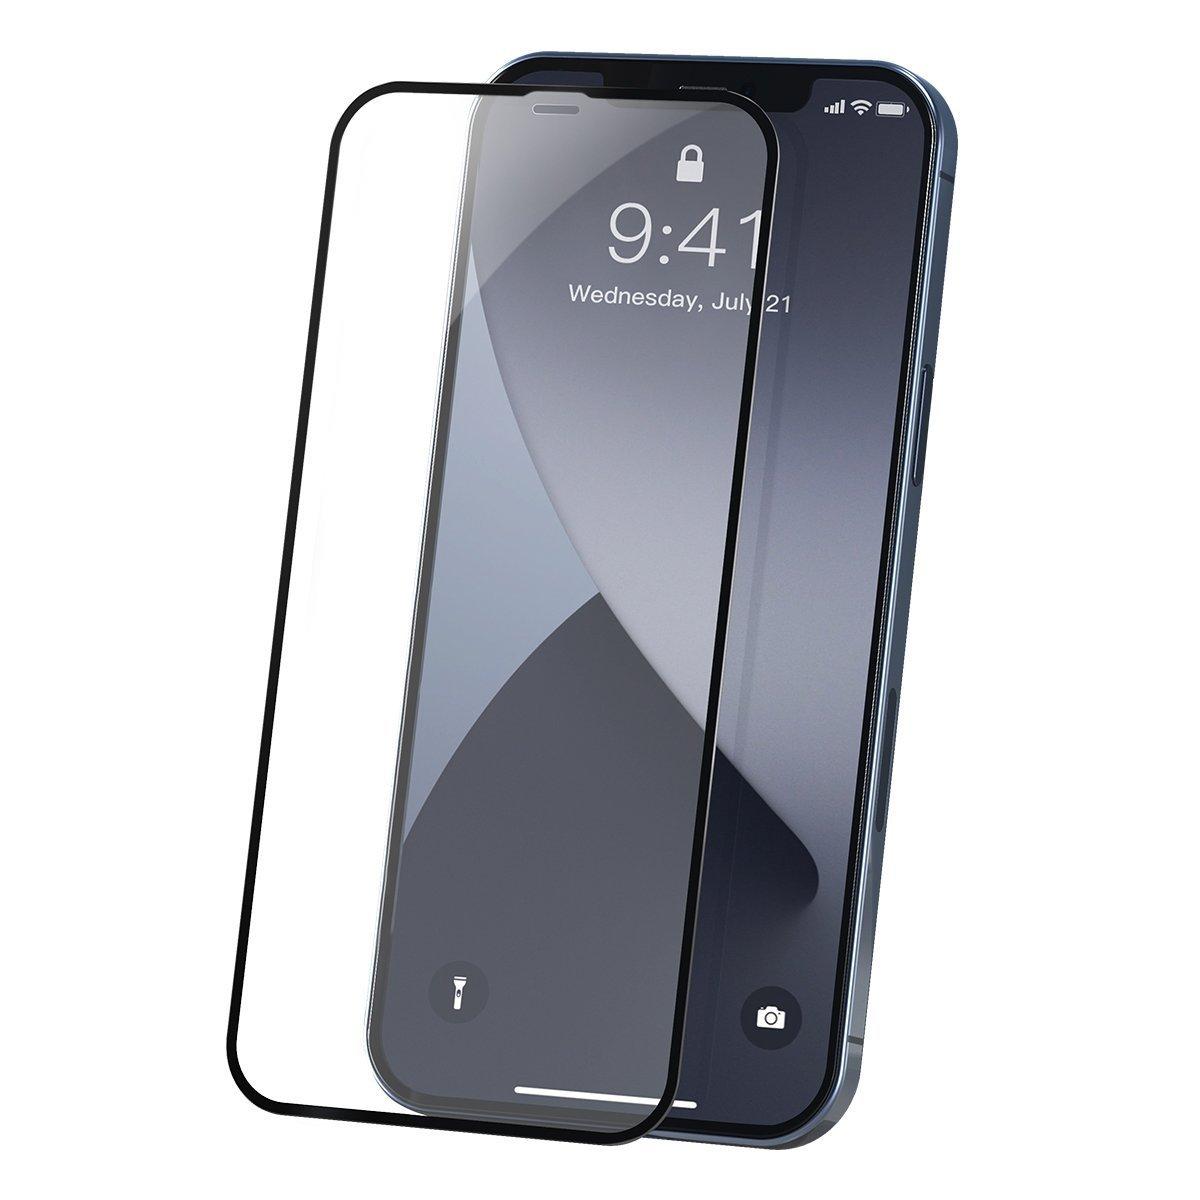 Set 2 folii de sticla pentru iPhone 12 Mini, Baseus Tempered Glass, Grosime 0.23mm, 5.4 inch imagine